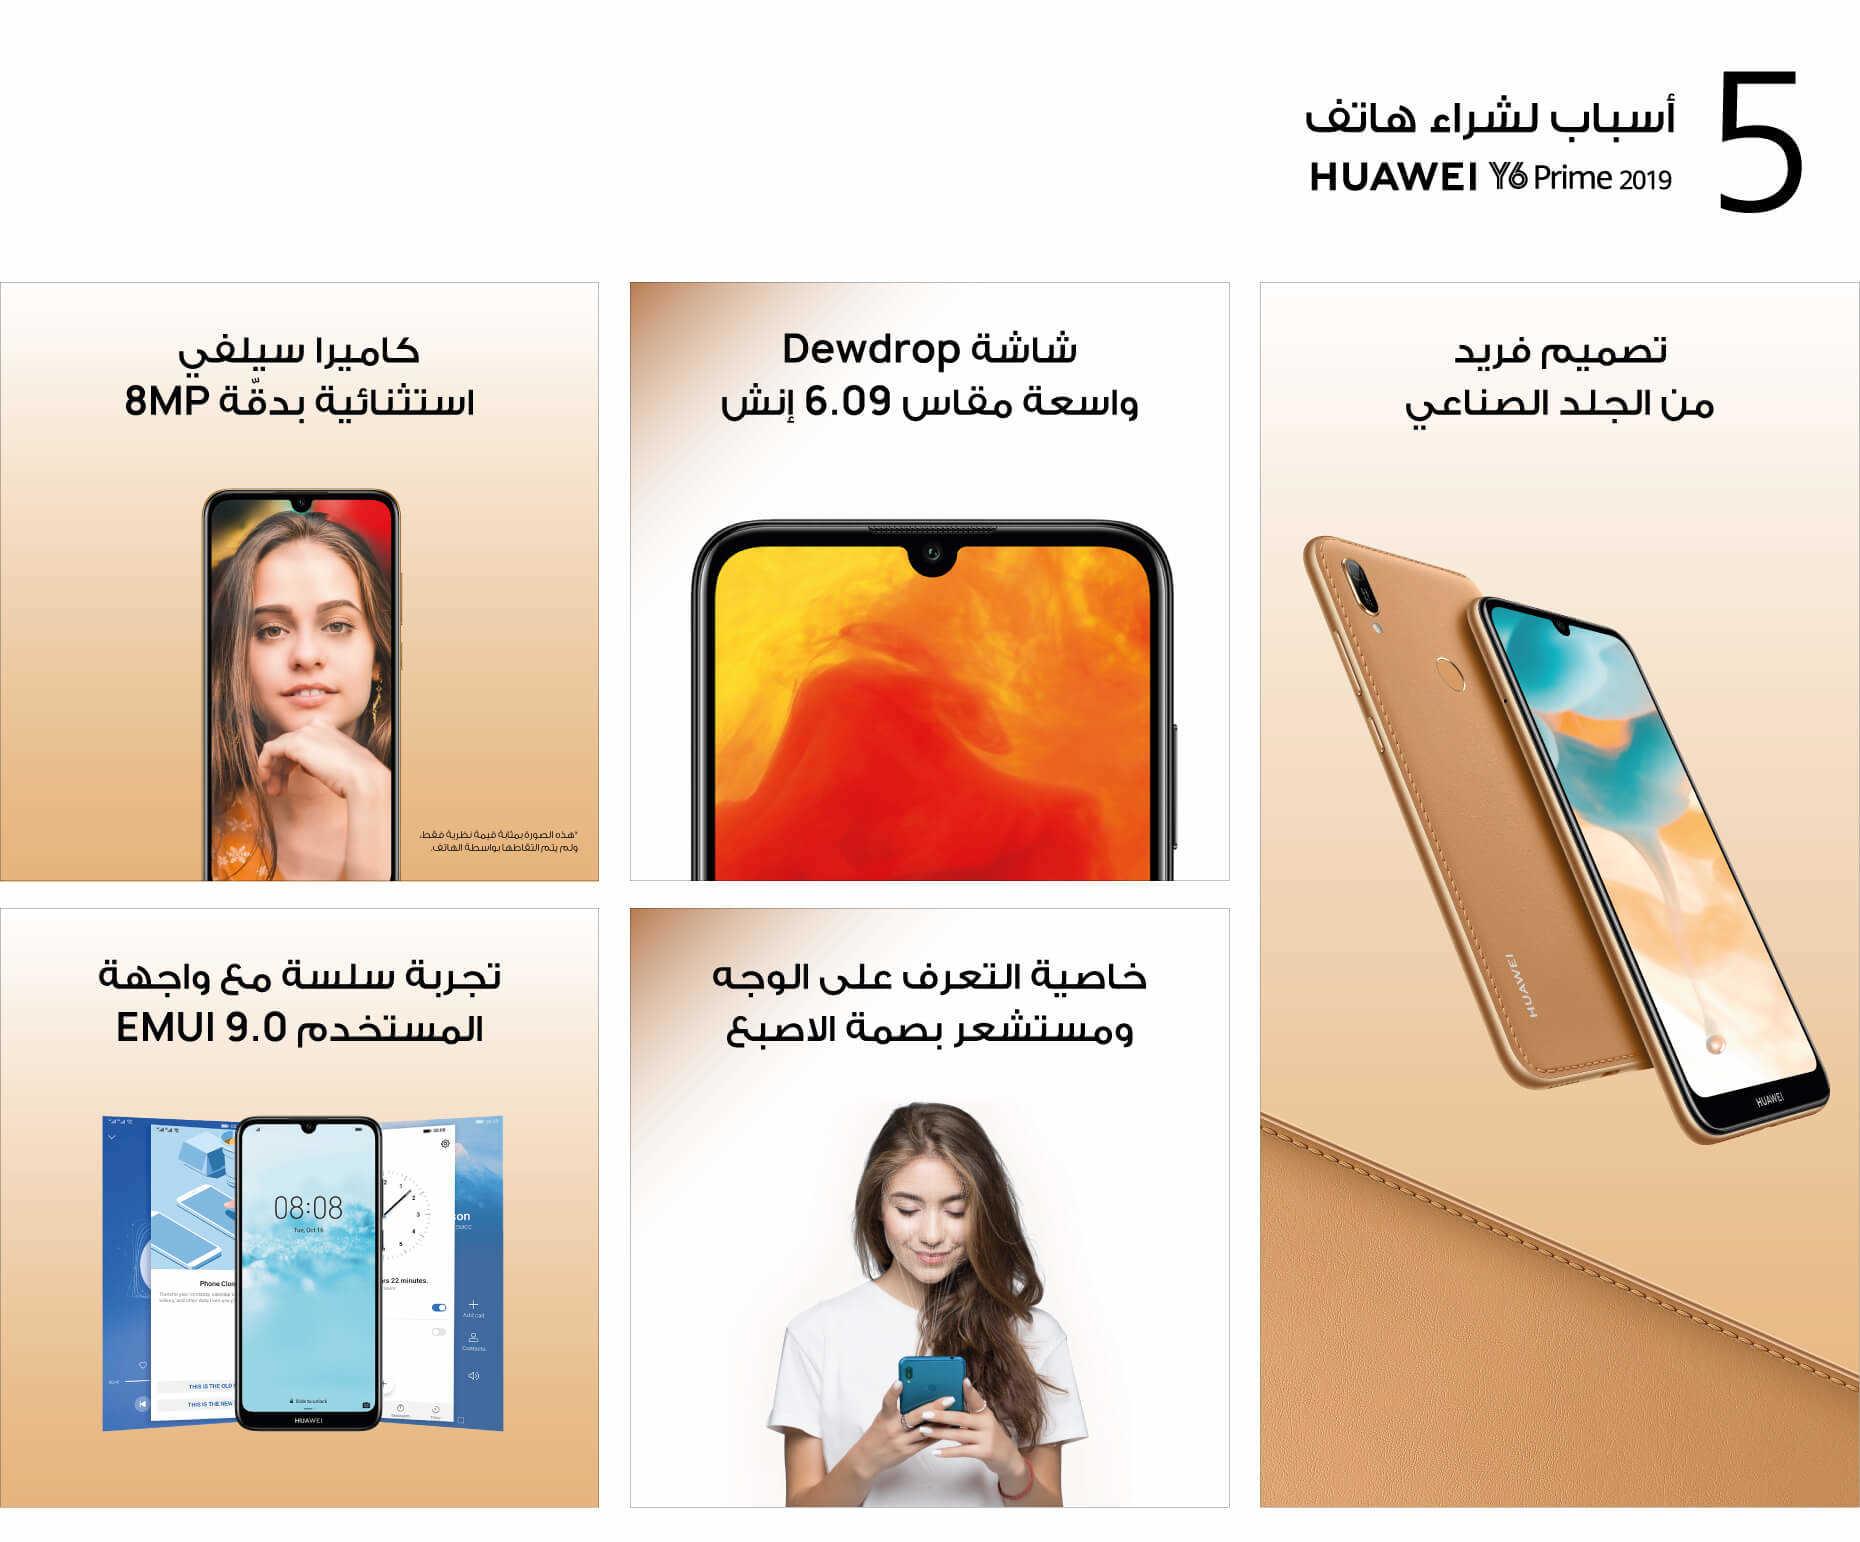 5 اسباب لشراء هاتف Y6 Prime 2019